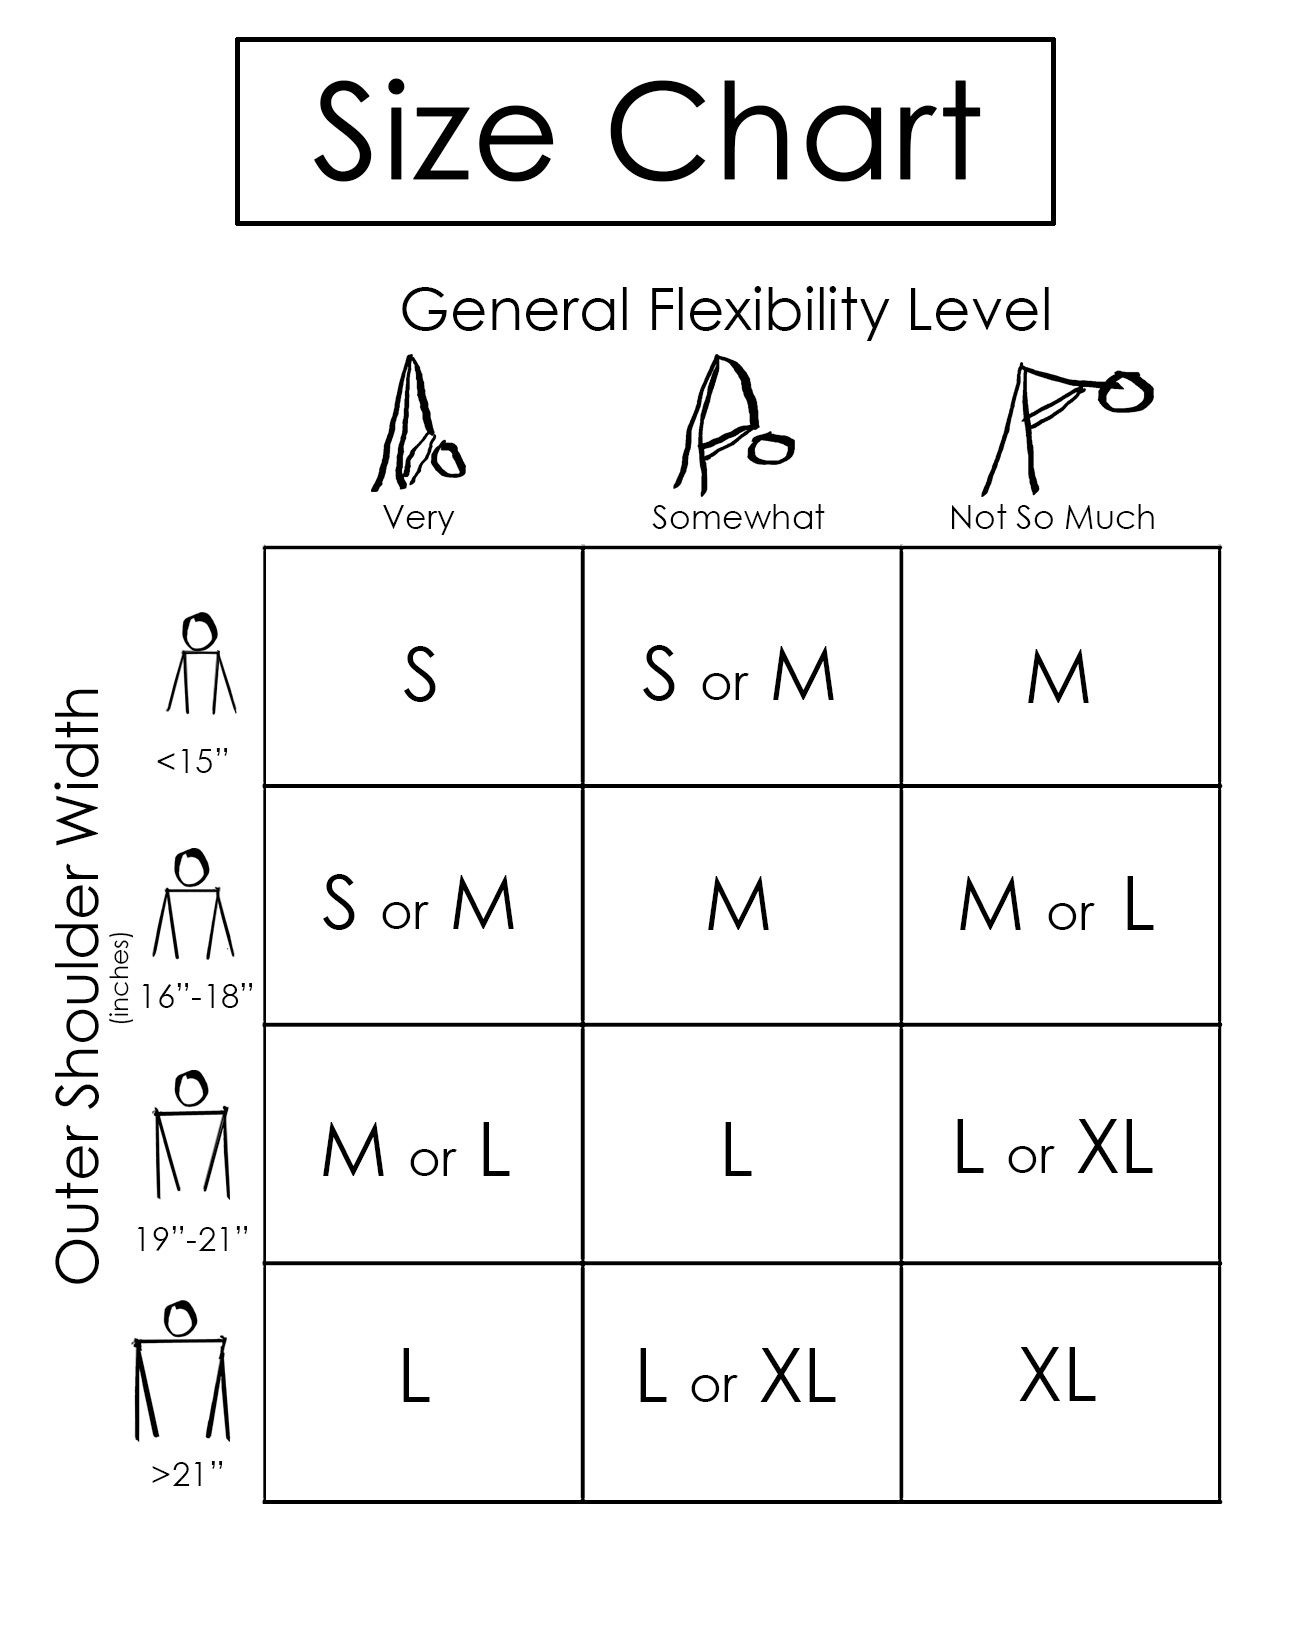 size_chart_grid-new.jpg